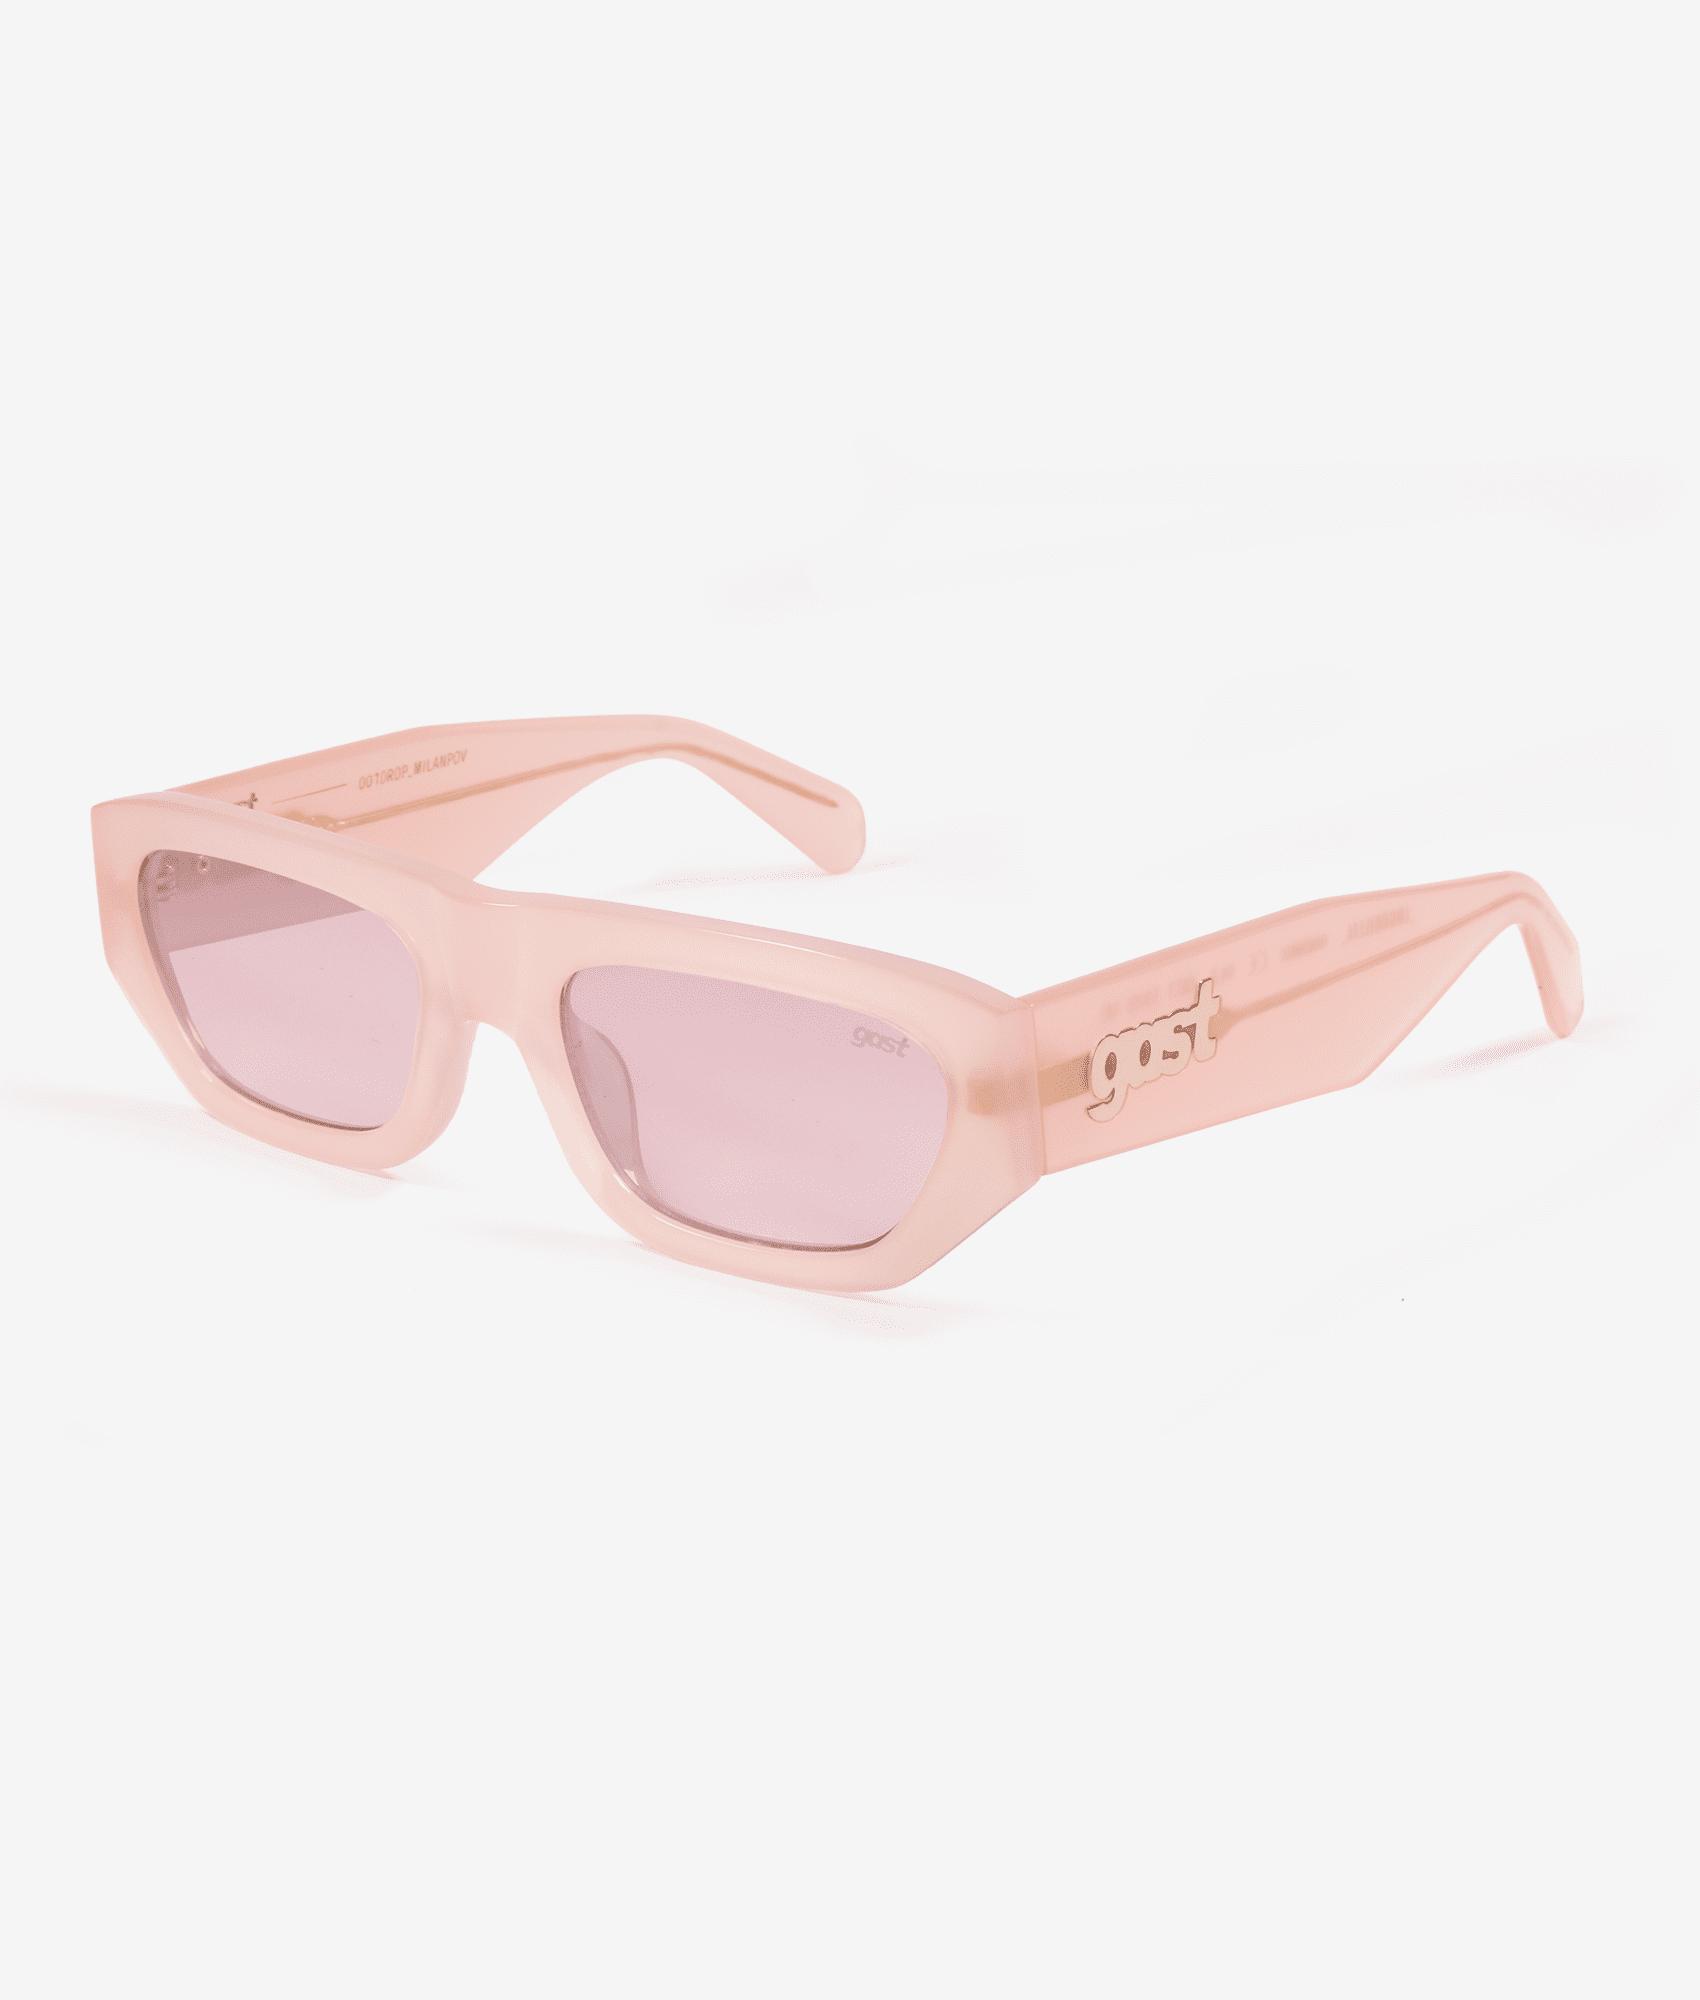 LOGOBILLIA Gast Sunglasses